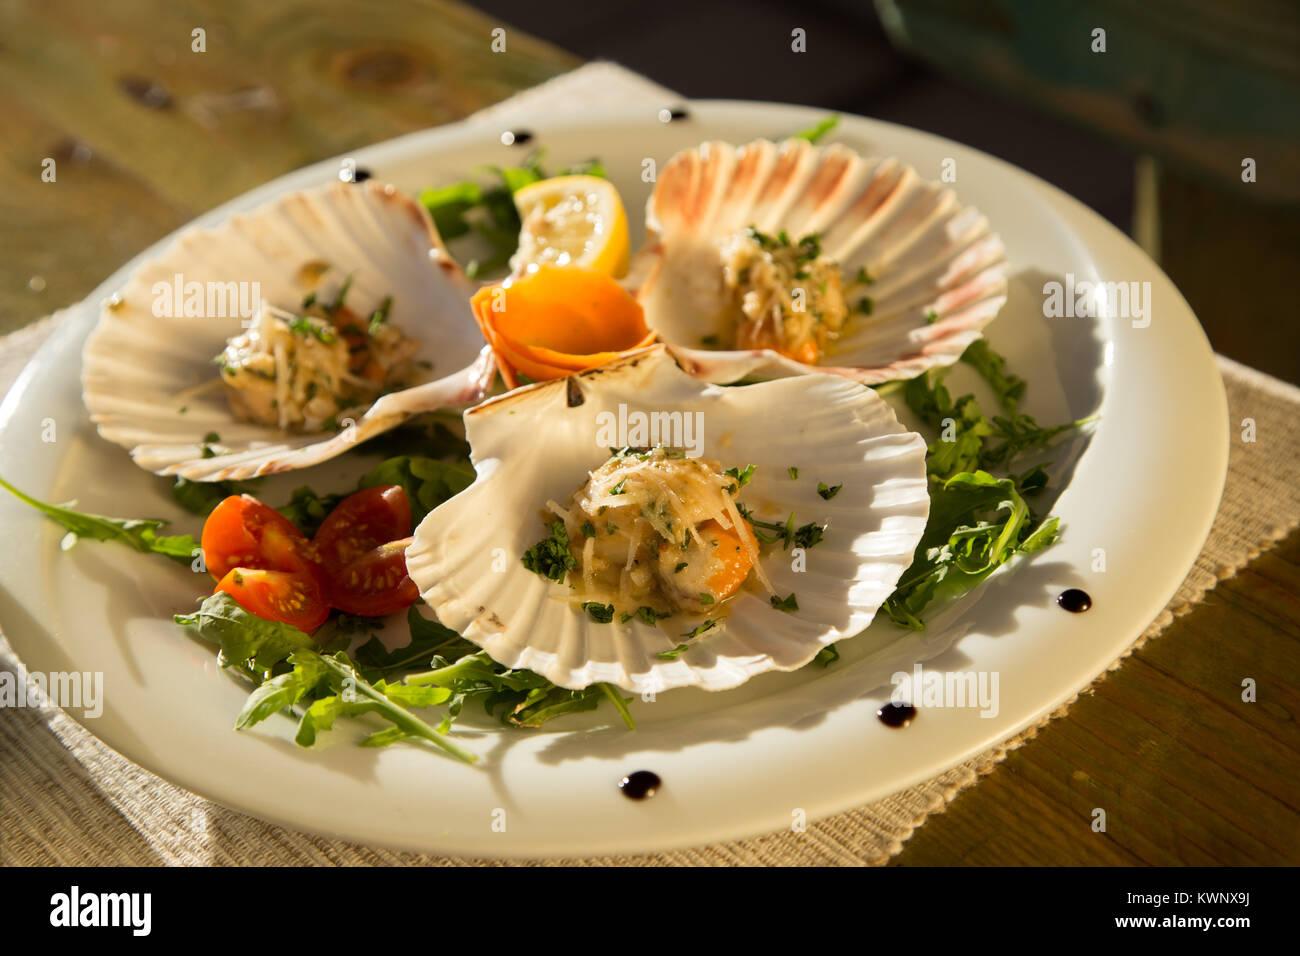 Scallops, restaurant Croatia. - Stock Image